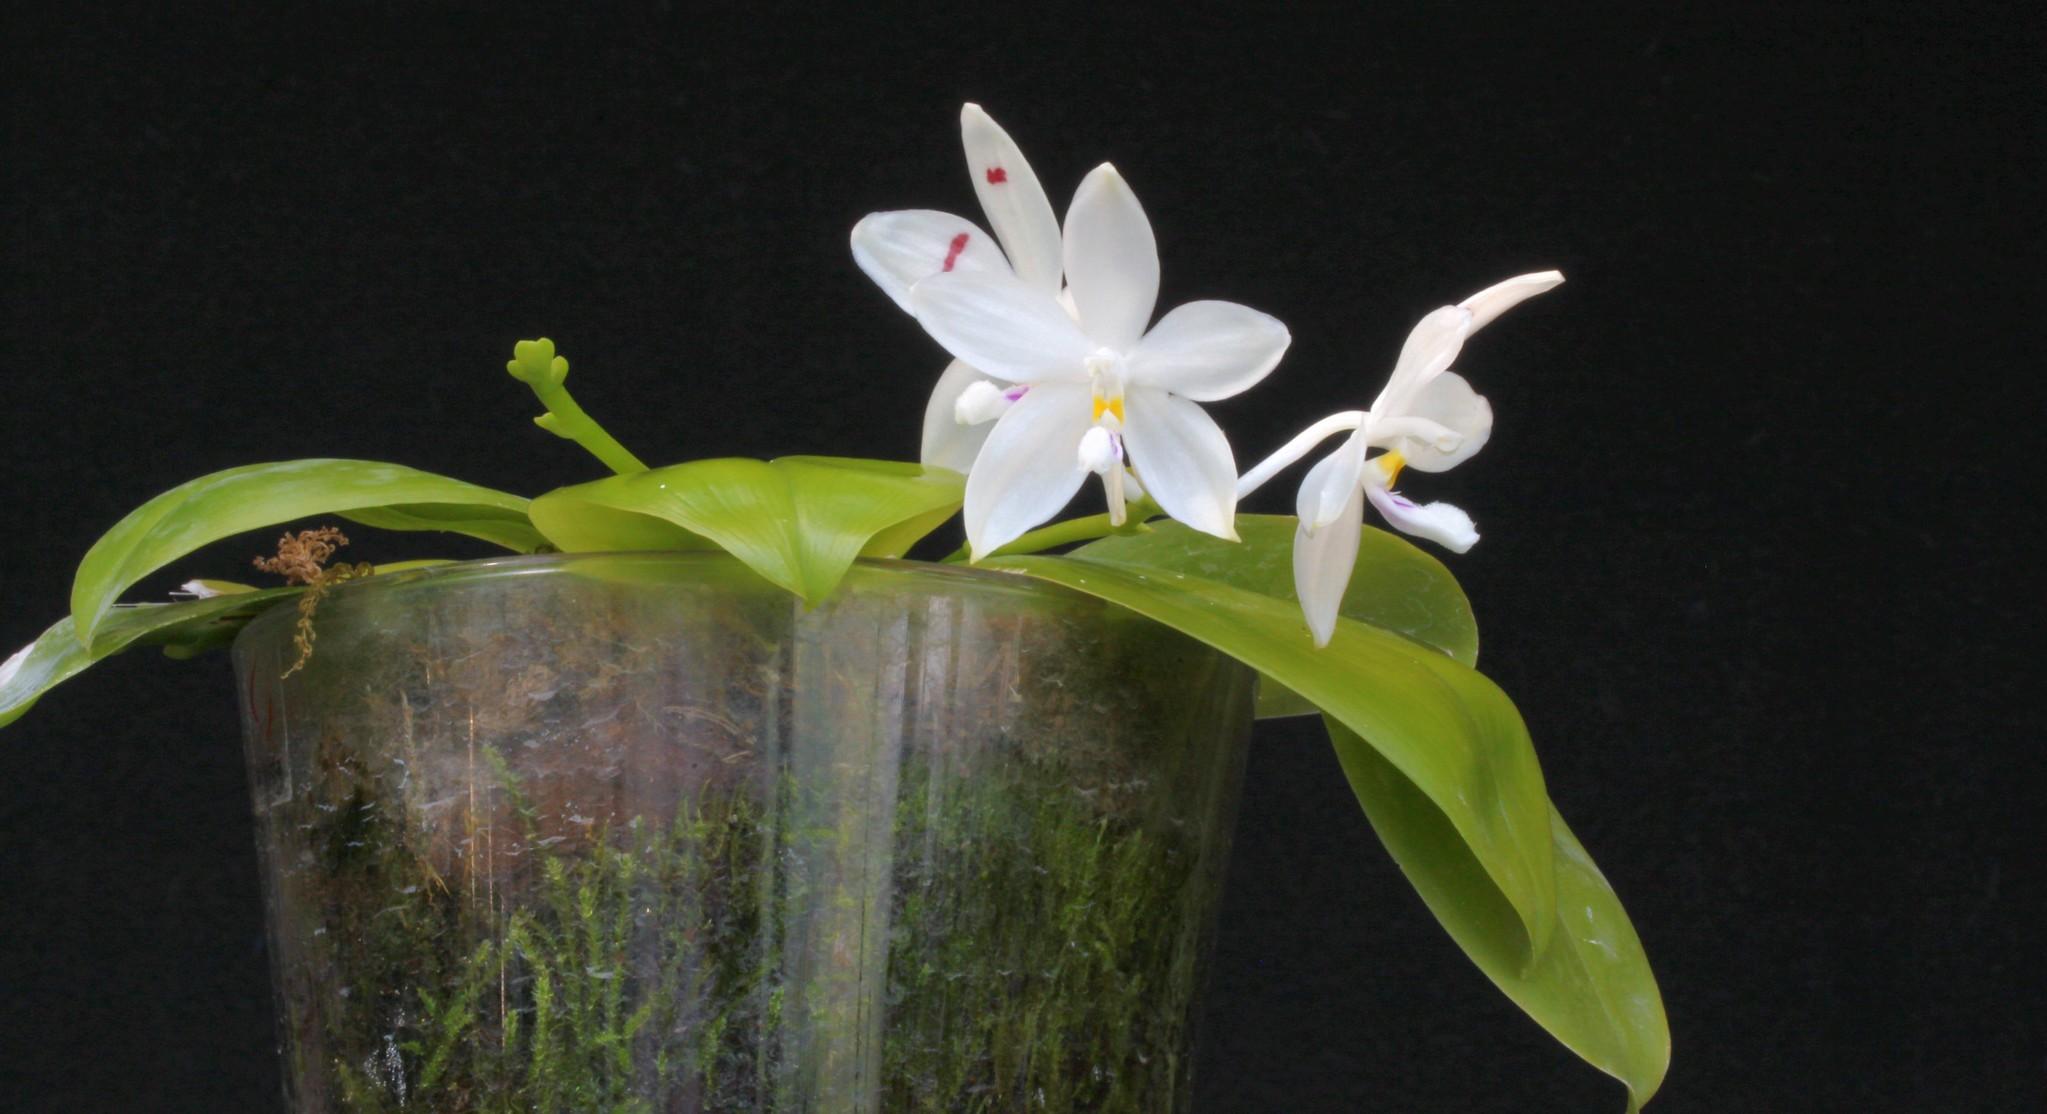 Phalaenopsis speciosa blue x speciosa red 51425622871_7df7f02cc8_k